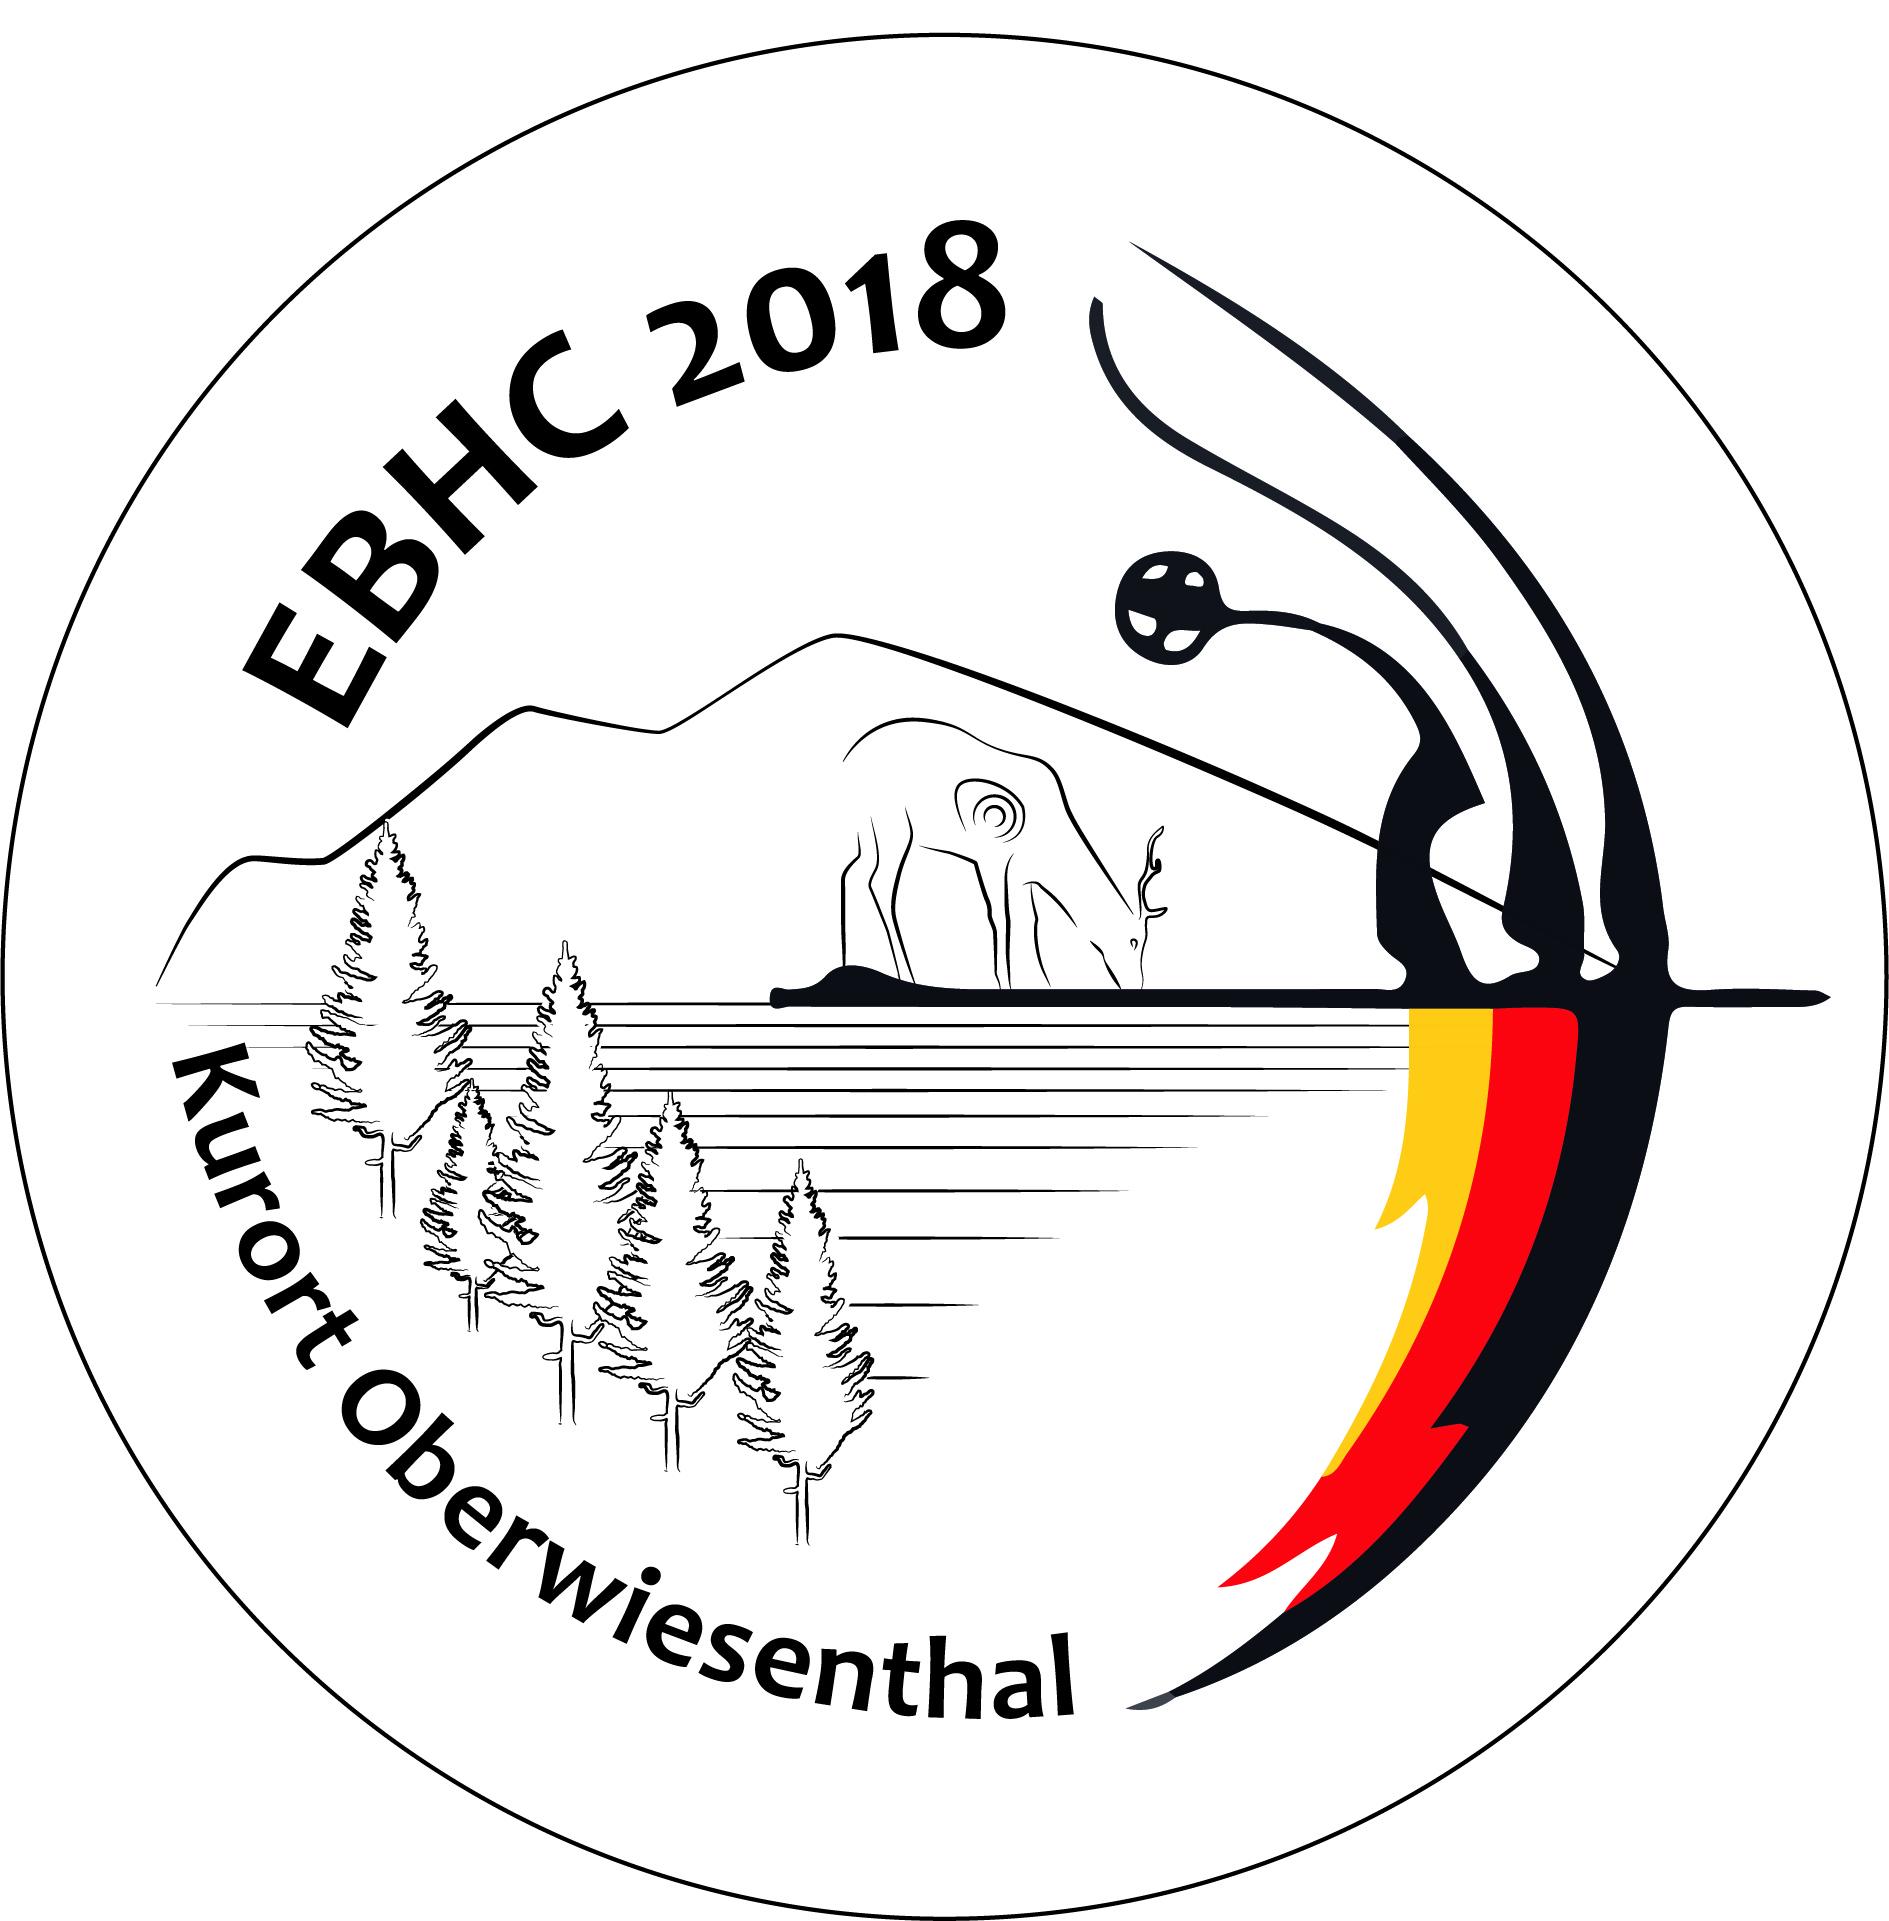 EBHC_2018_Oberwiesenthal_3